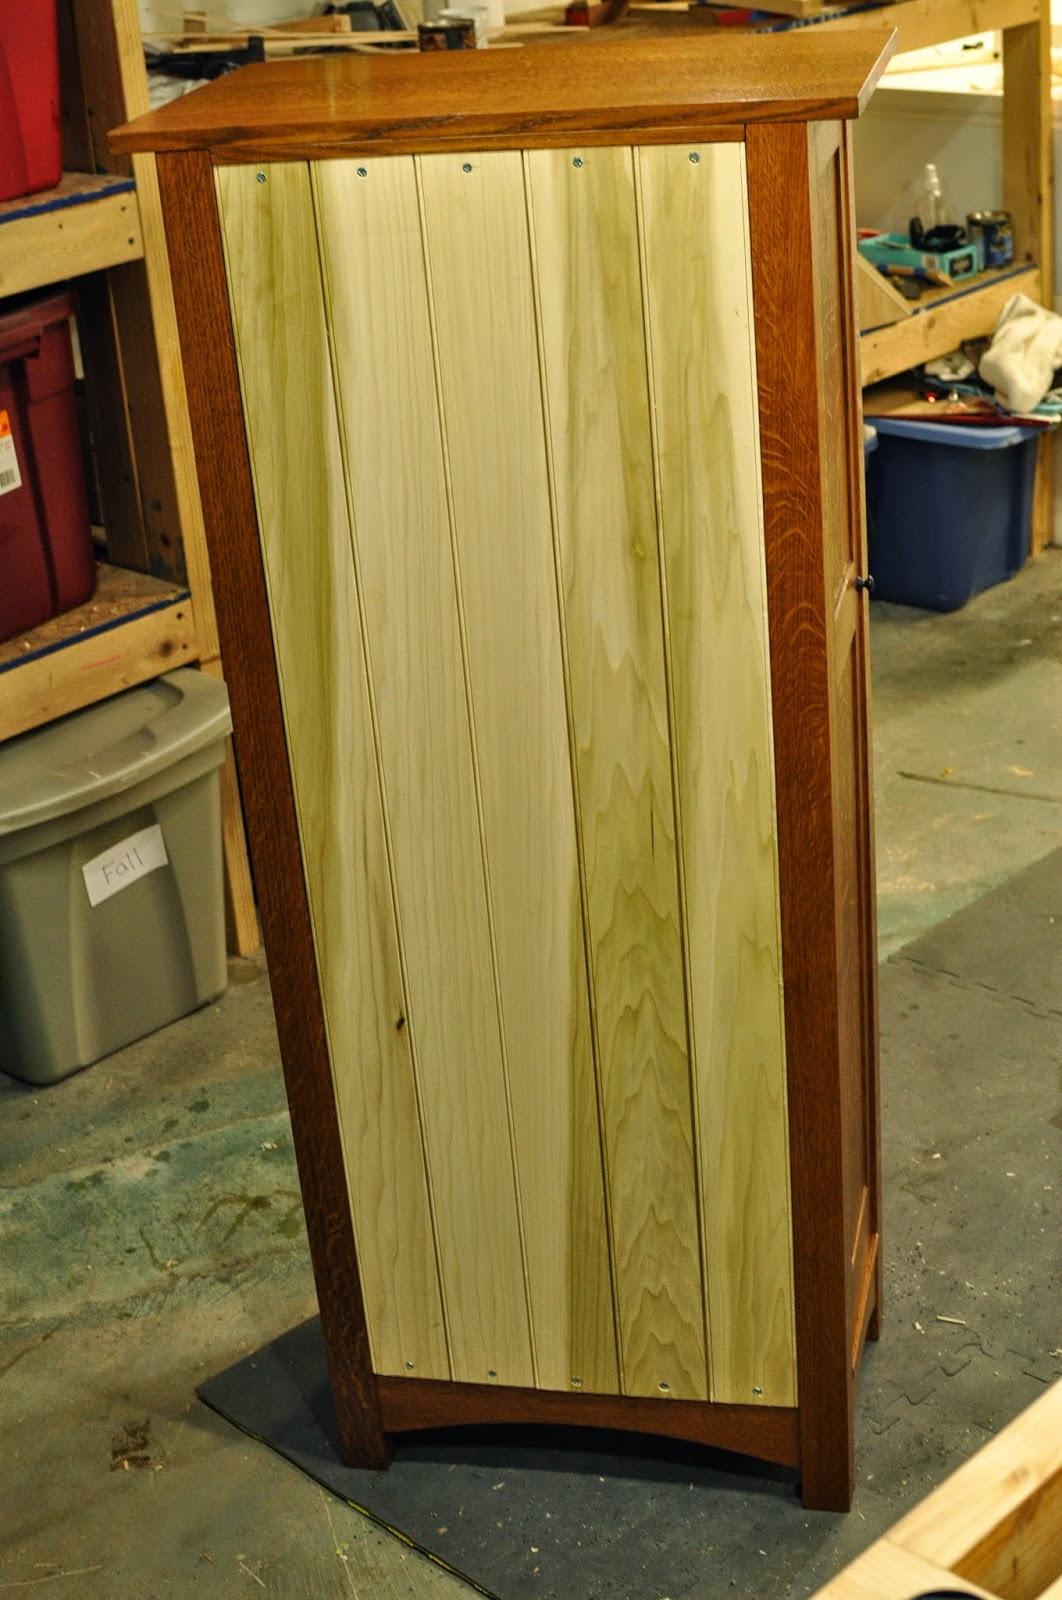 Honey Do Woodworking